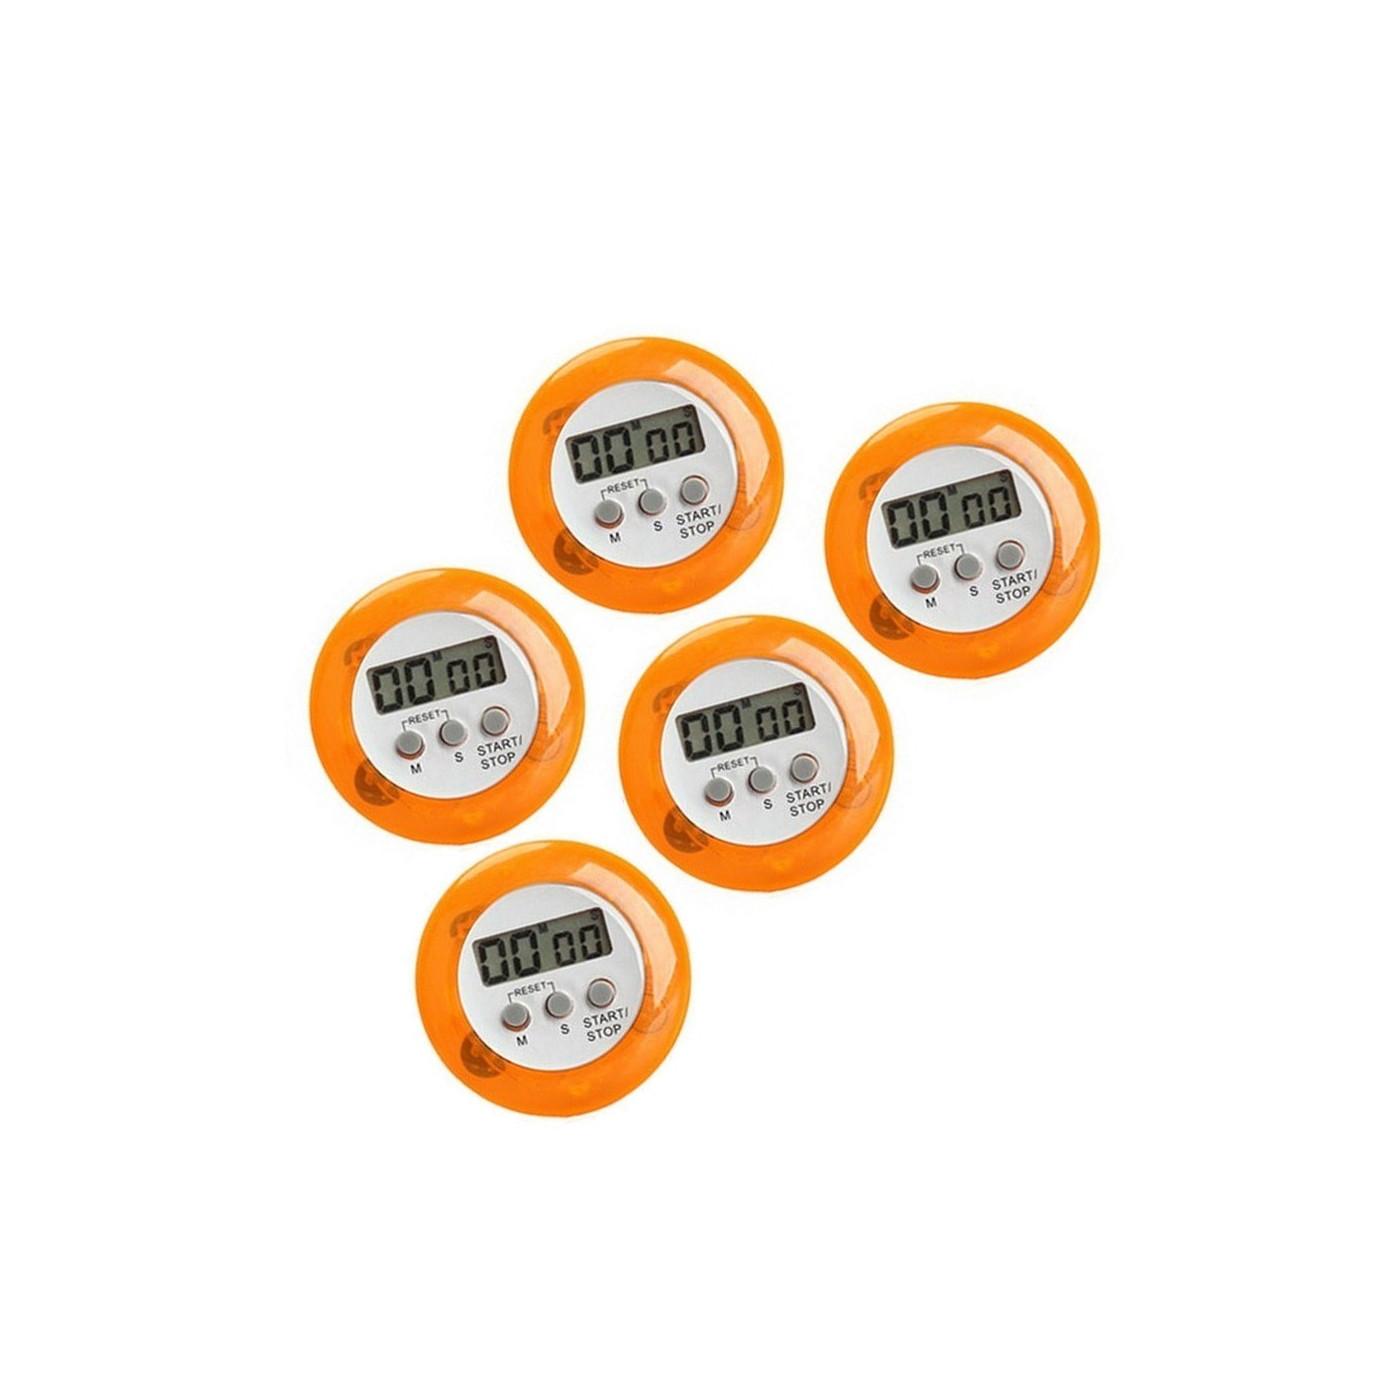 Set of 5 digital kitchen timers, alarm clocks, orange